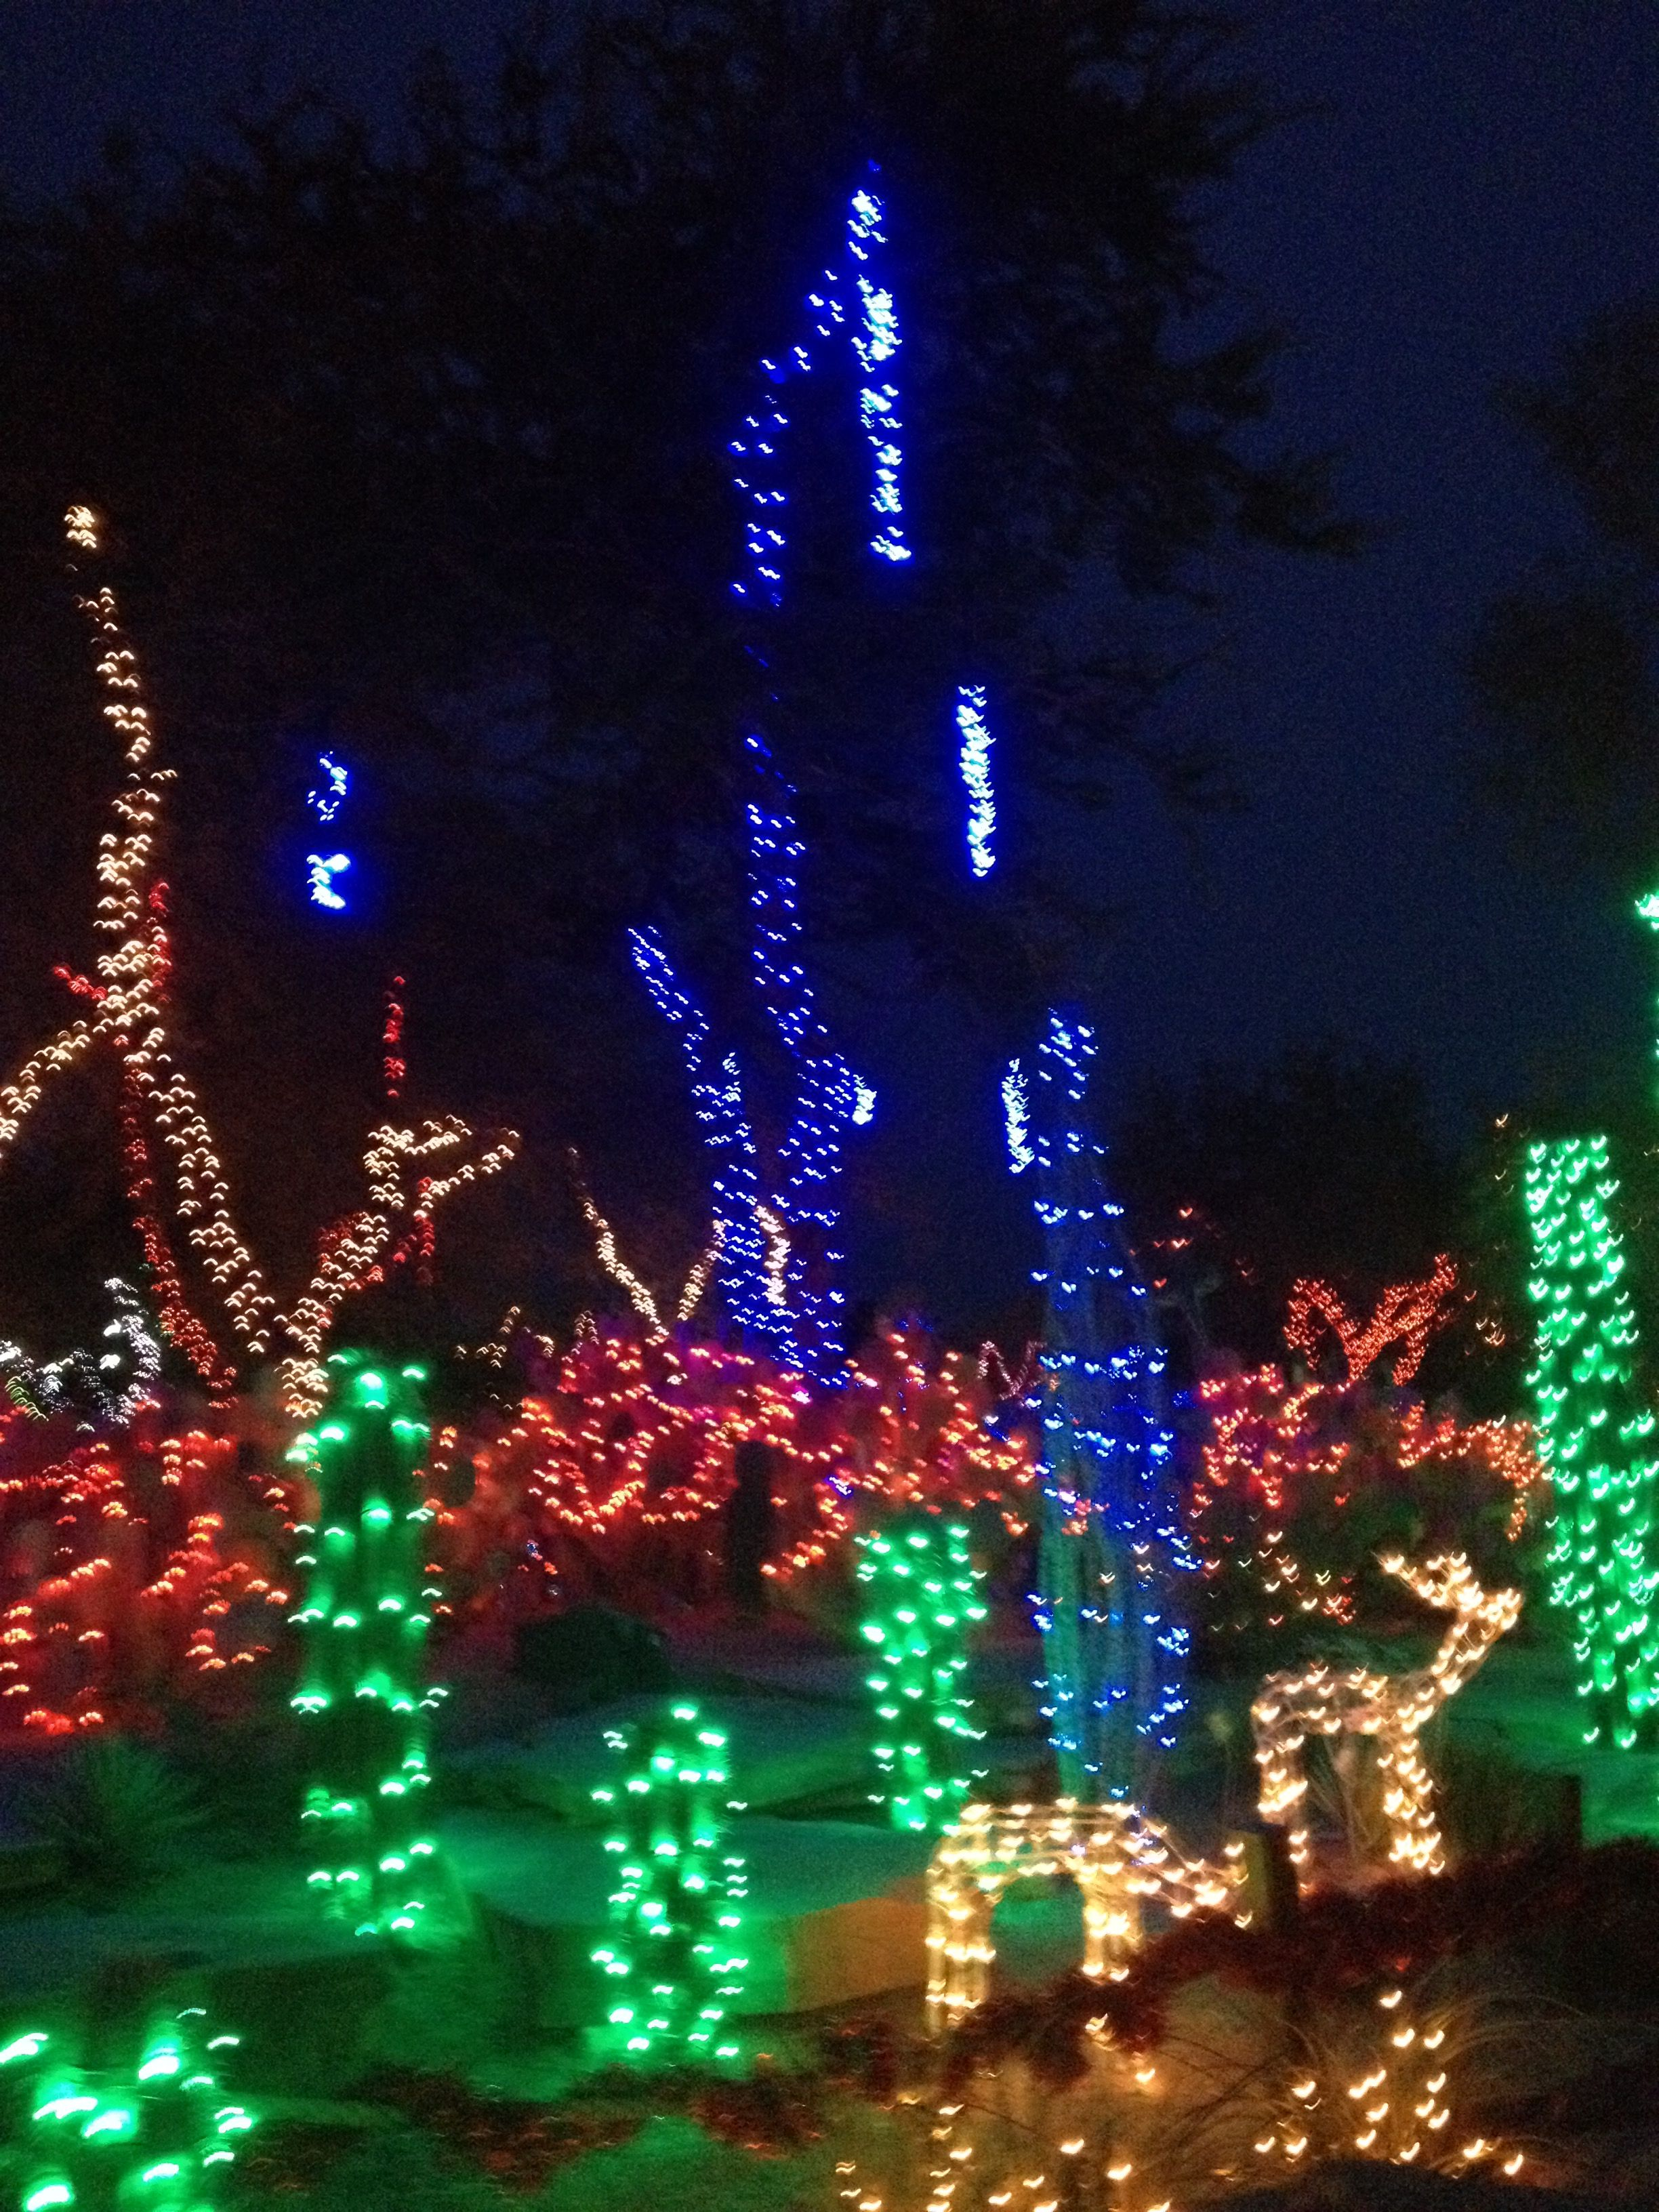 Ethel M Choc Cactus Garden Holiday, Cactus, Christmas